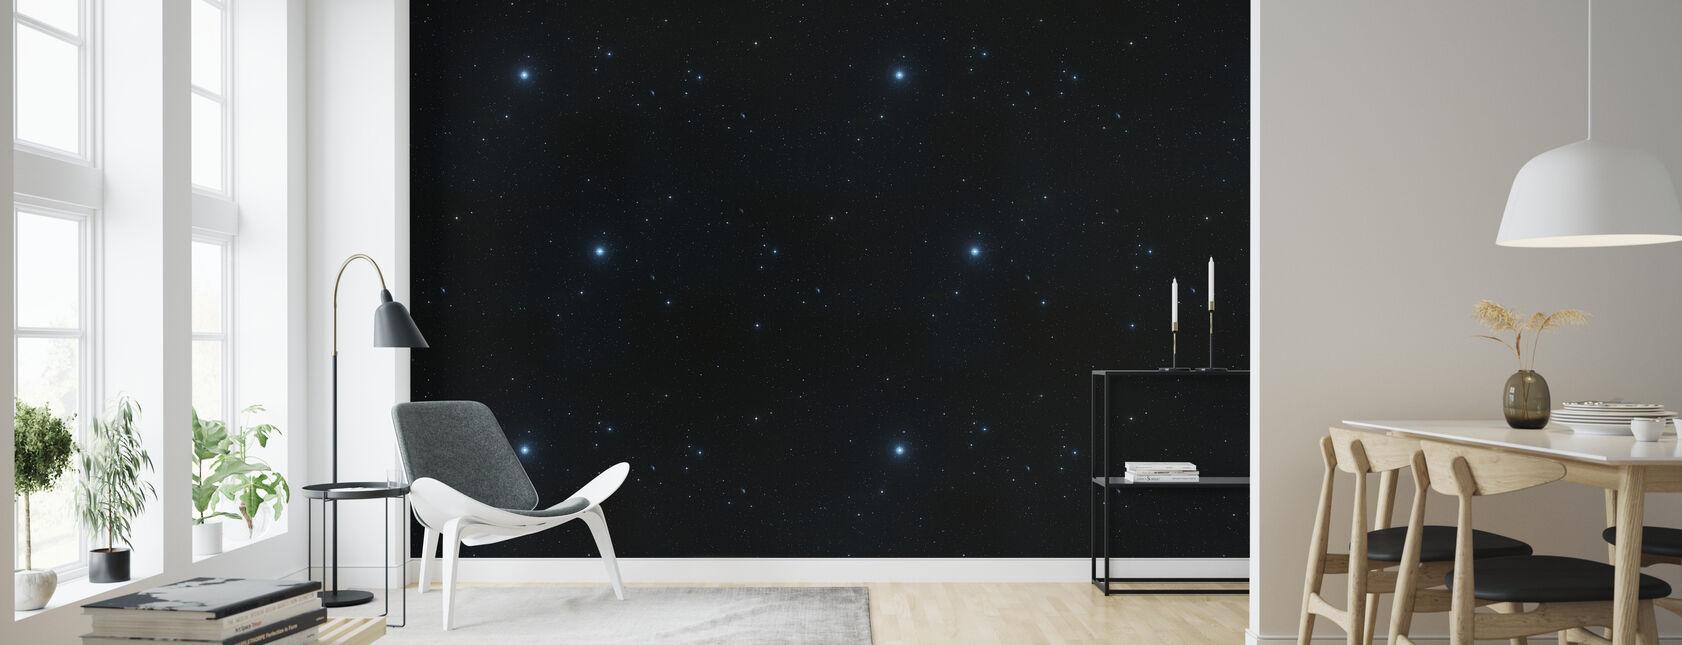 Stjärnly - Tapet - Vardagsrum